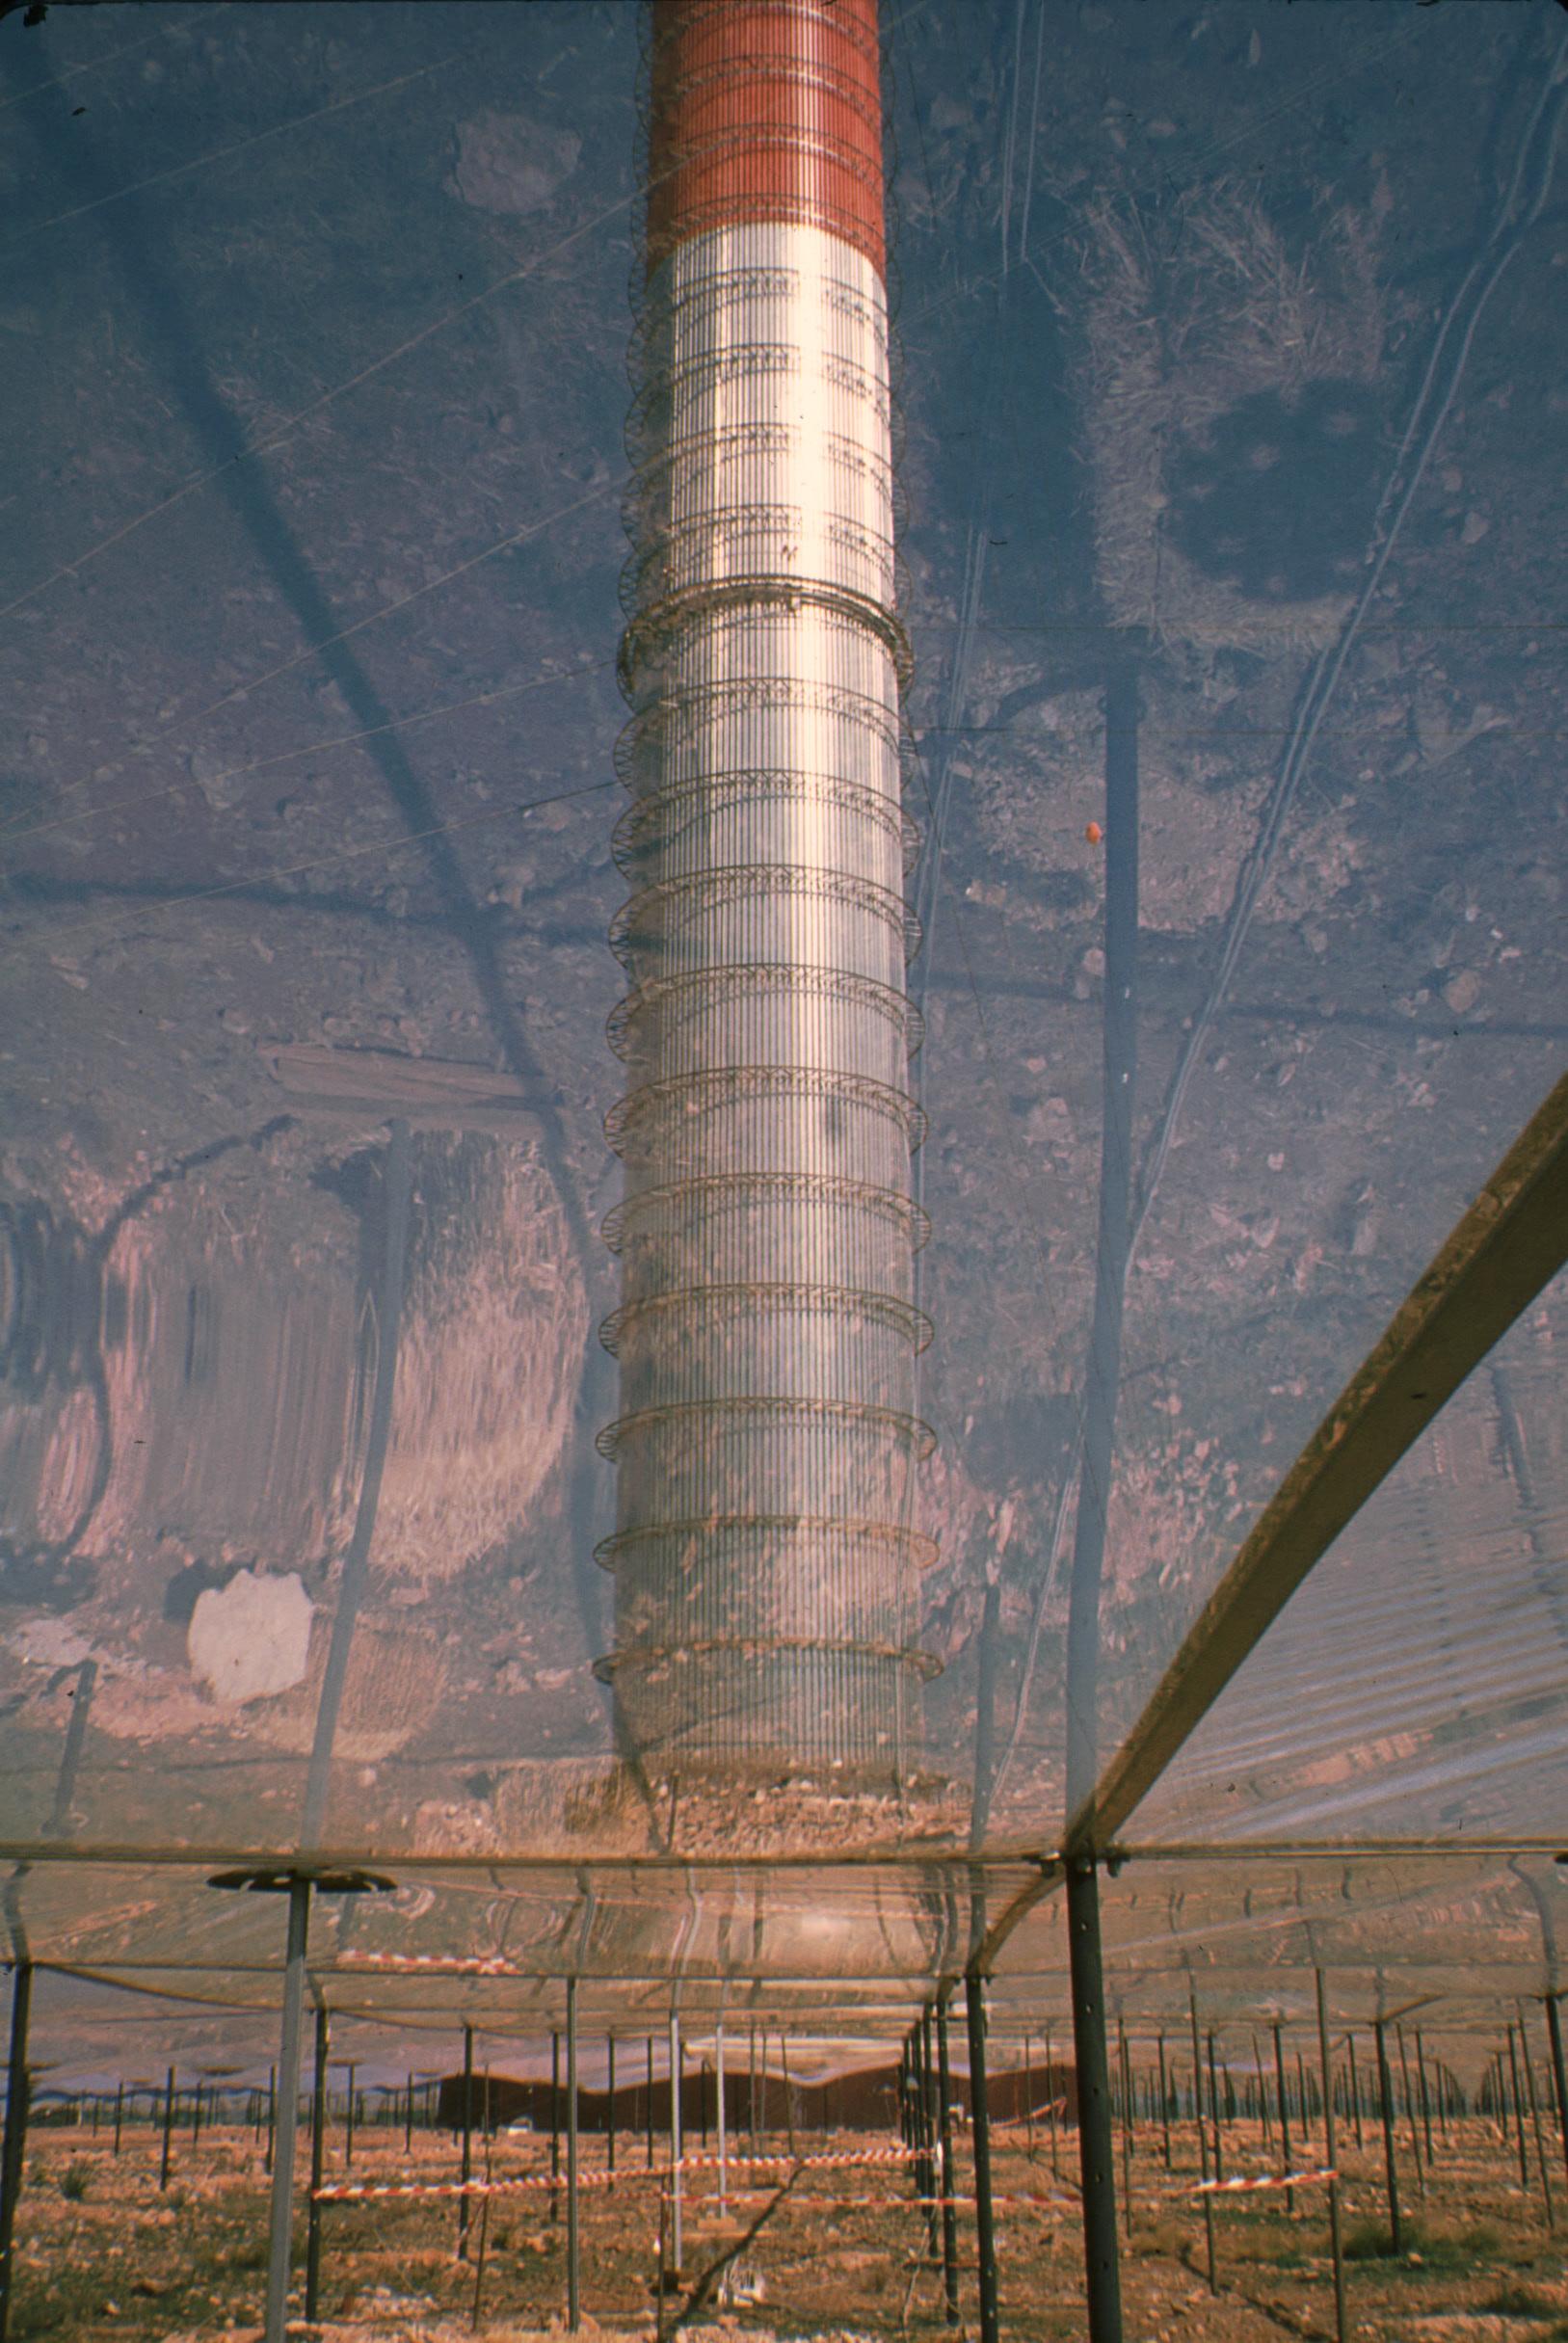 Pilotprojekt Aufwindkraftwerk Manzanares